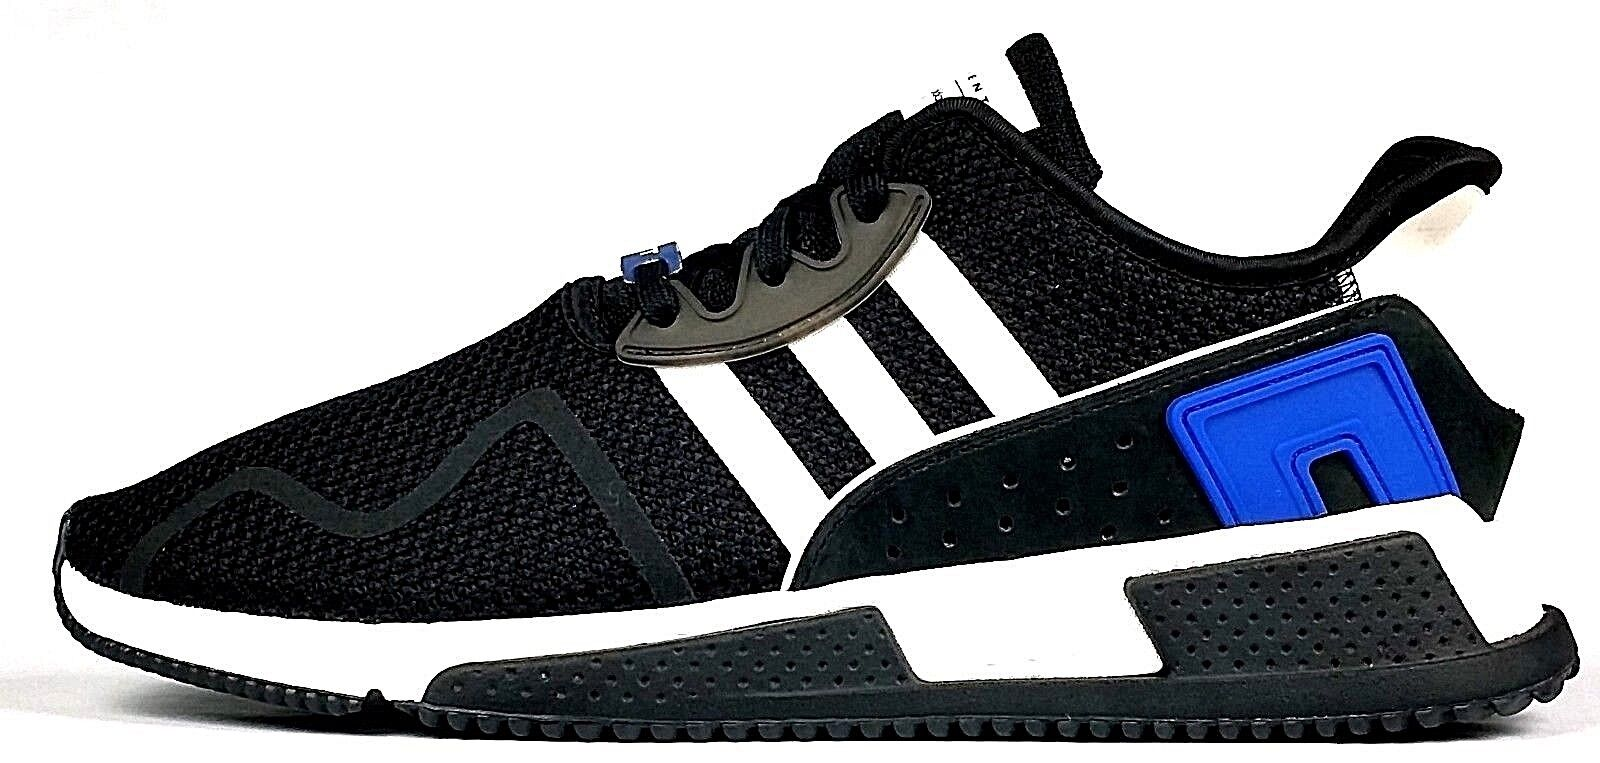 Adidas Originals EQT Cushion ADV Men's Casual shoes Core Black Royal bluee White